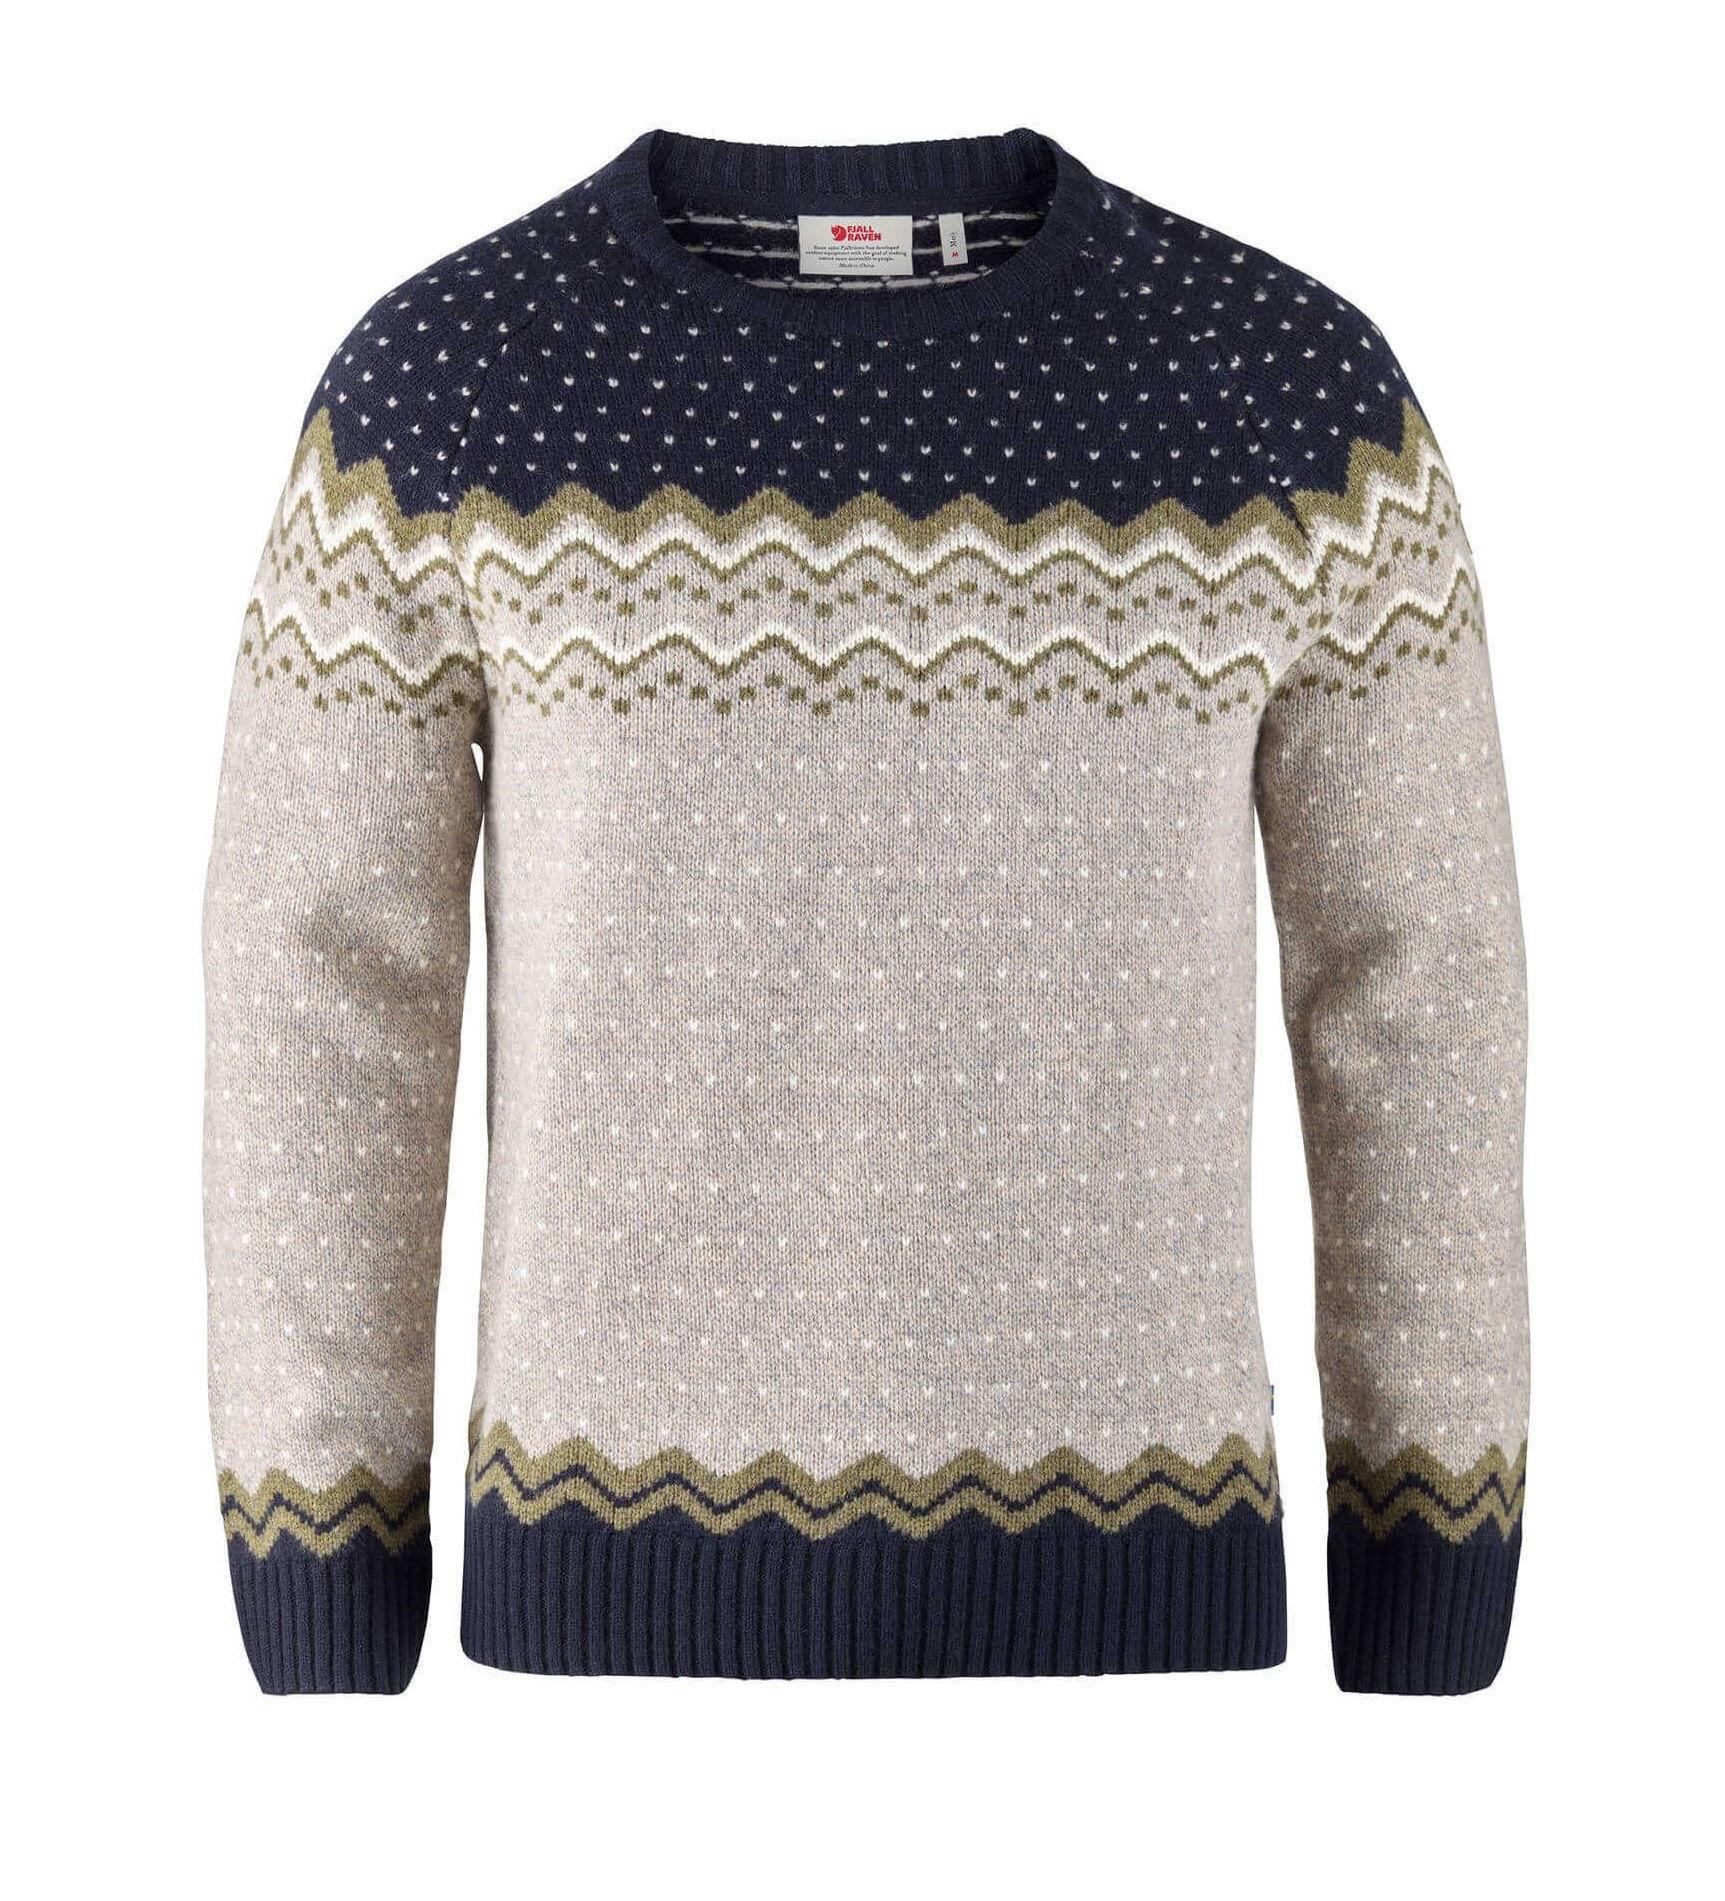 Bilde av Övik Knit Sweater M